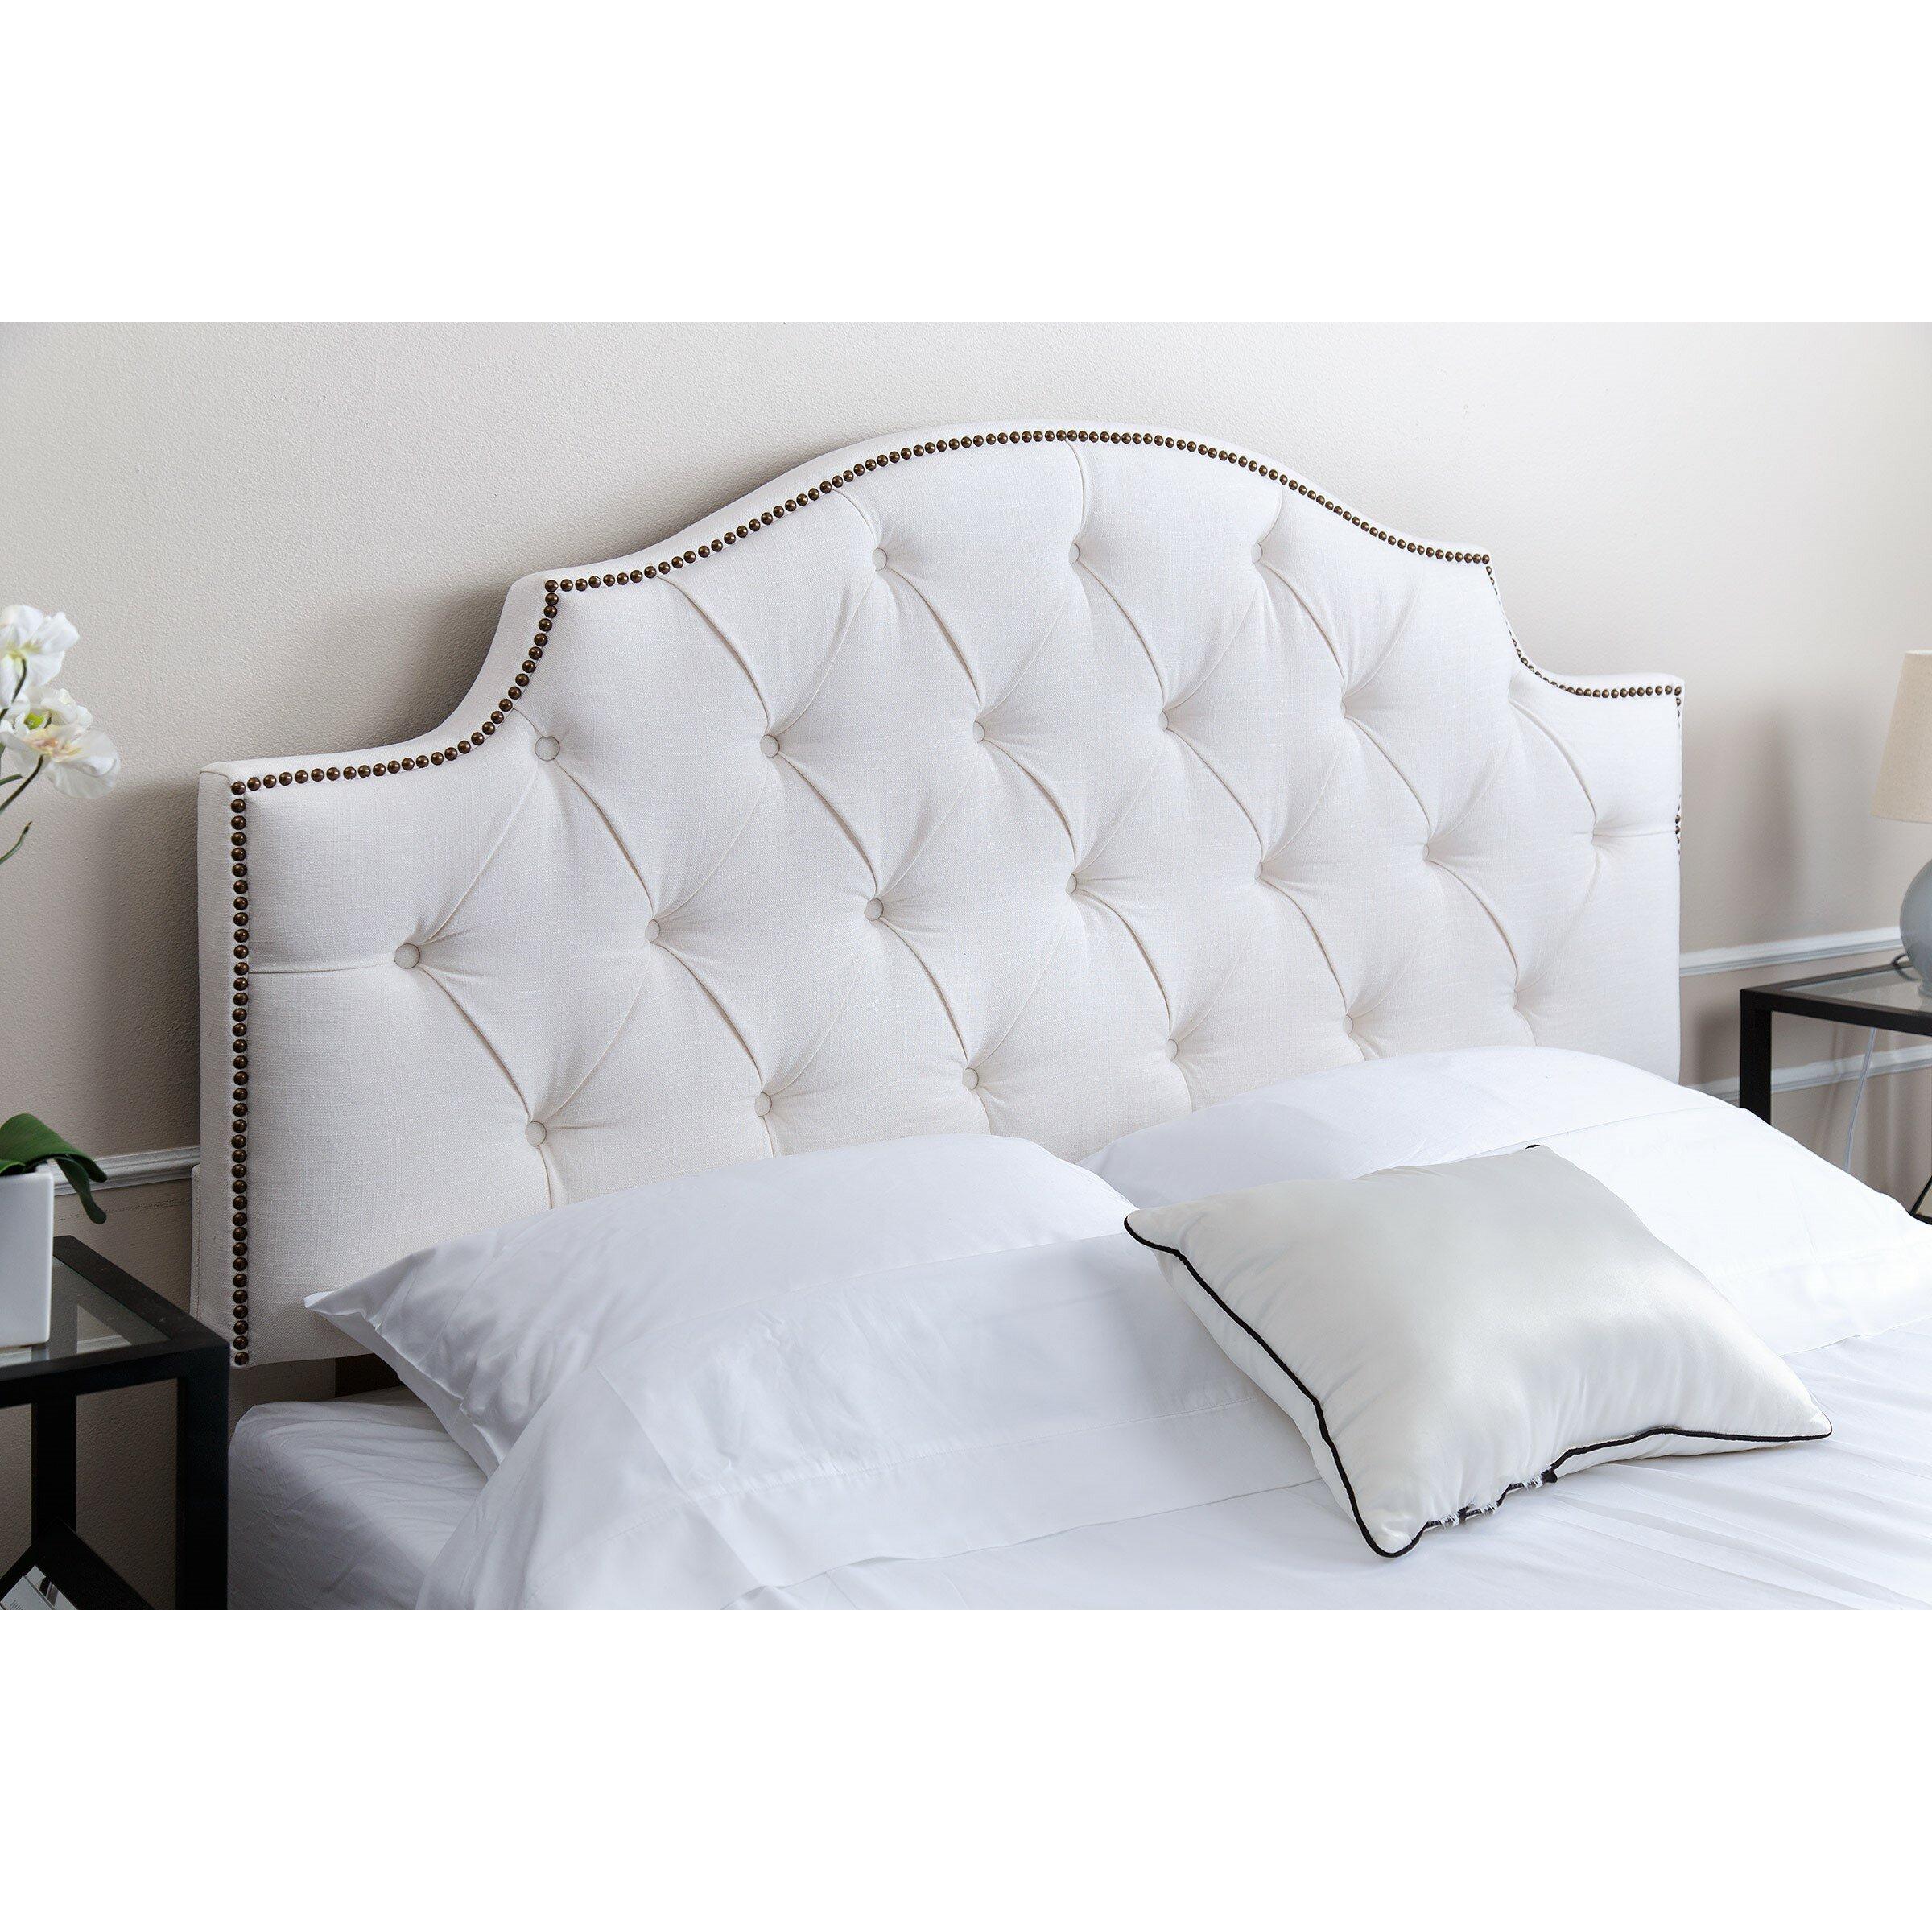 Mia Bedroom Furniture Mia Upholstered Headboard Reviews Joss Main